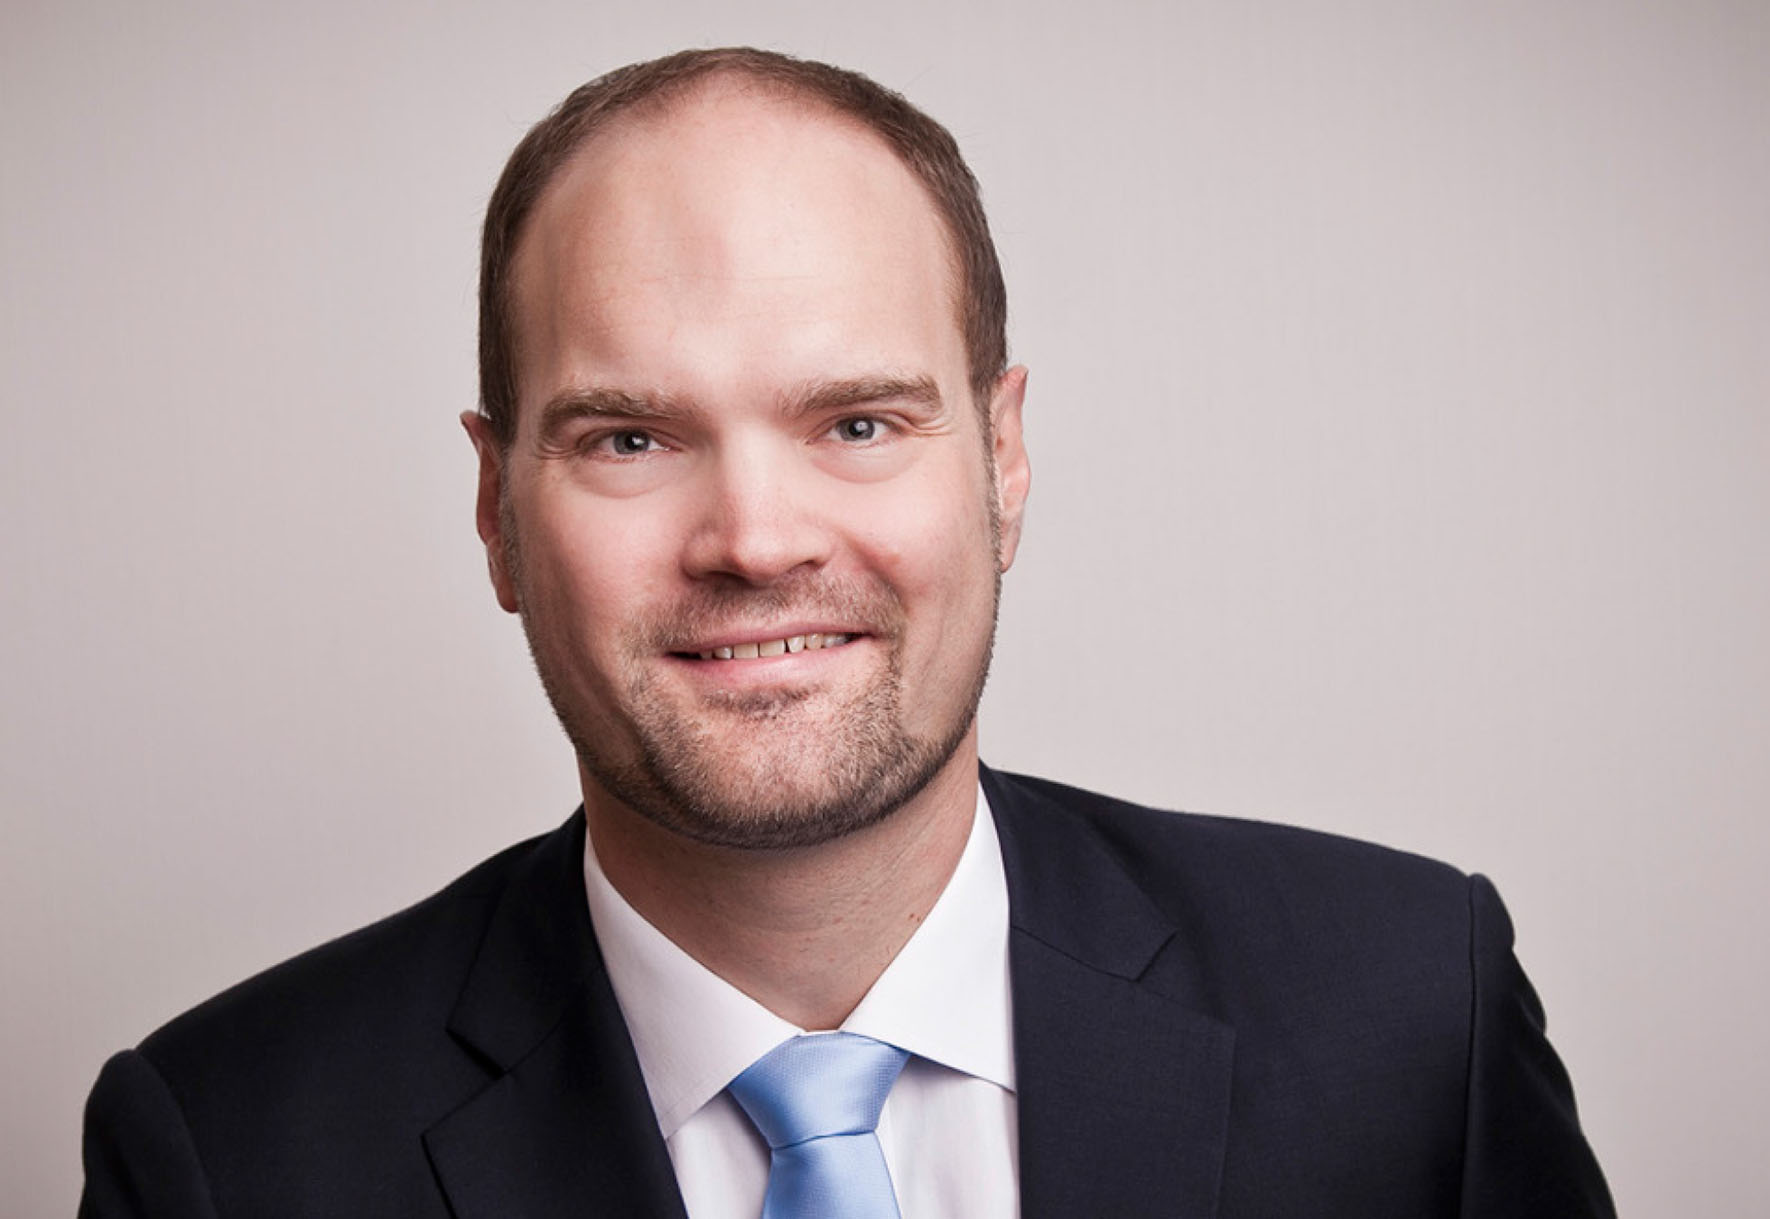 Thomas M. Kühne